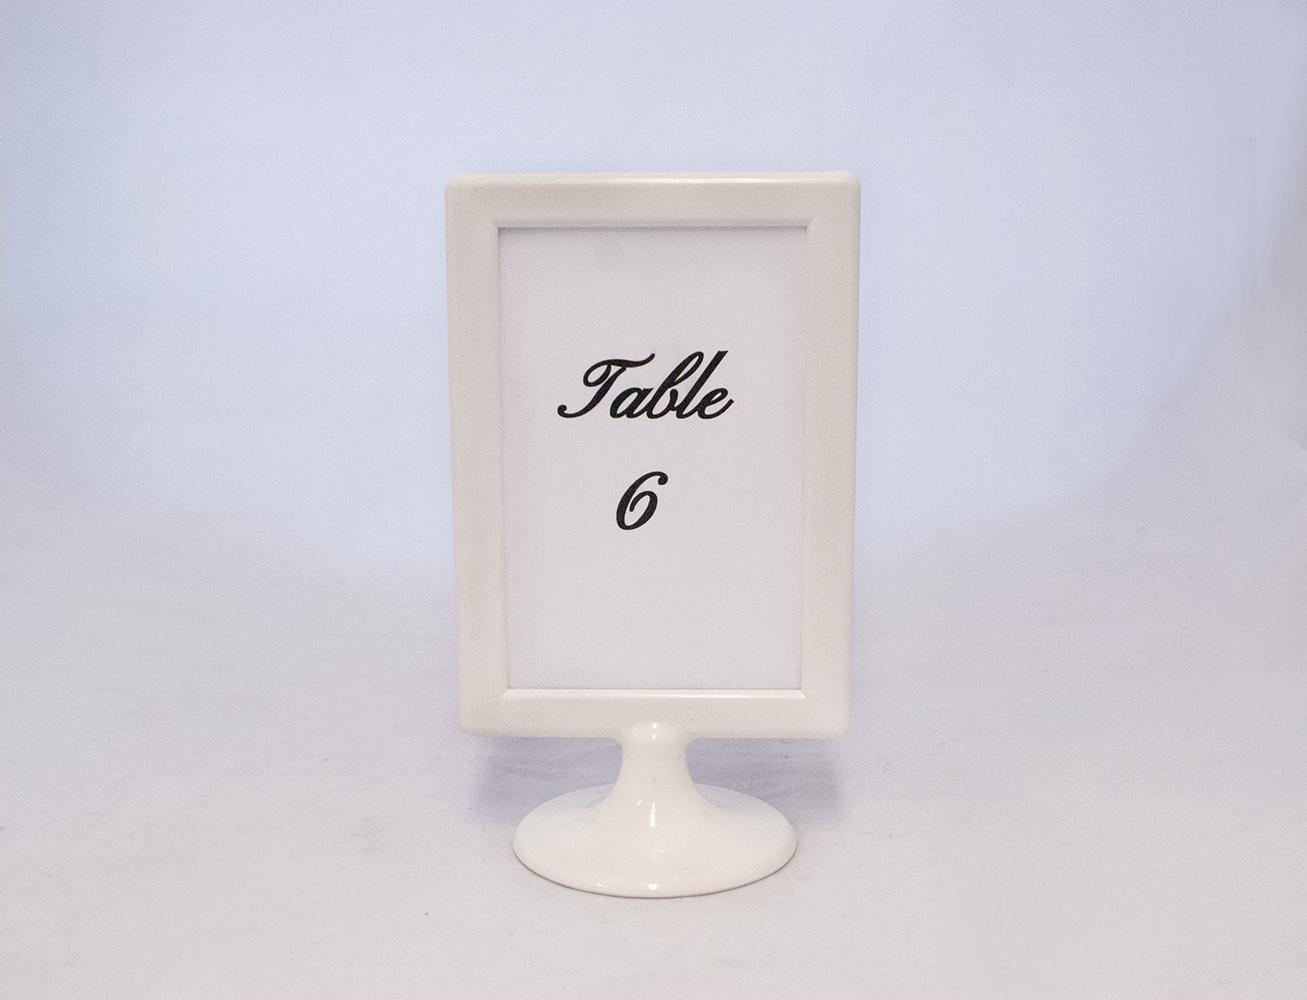 white frame pedestal   Quantity: 14  Price: $8.50